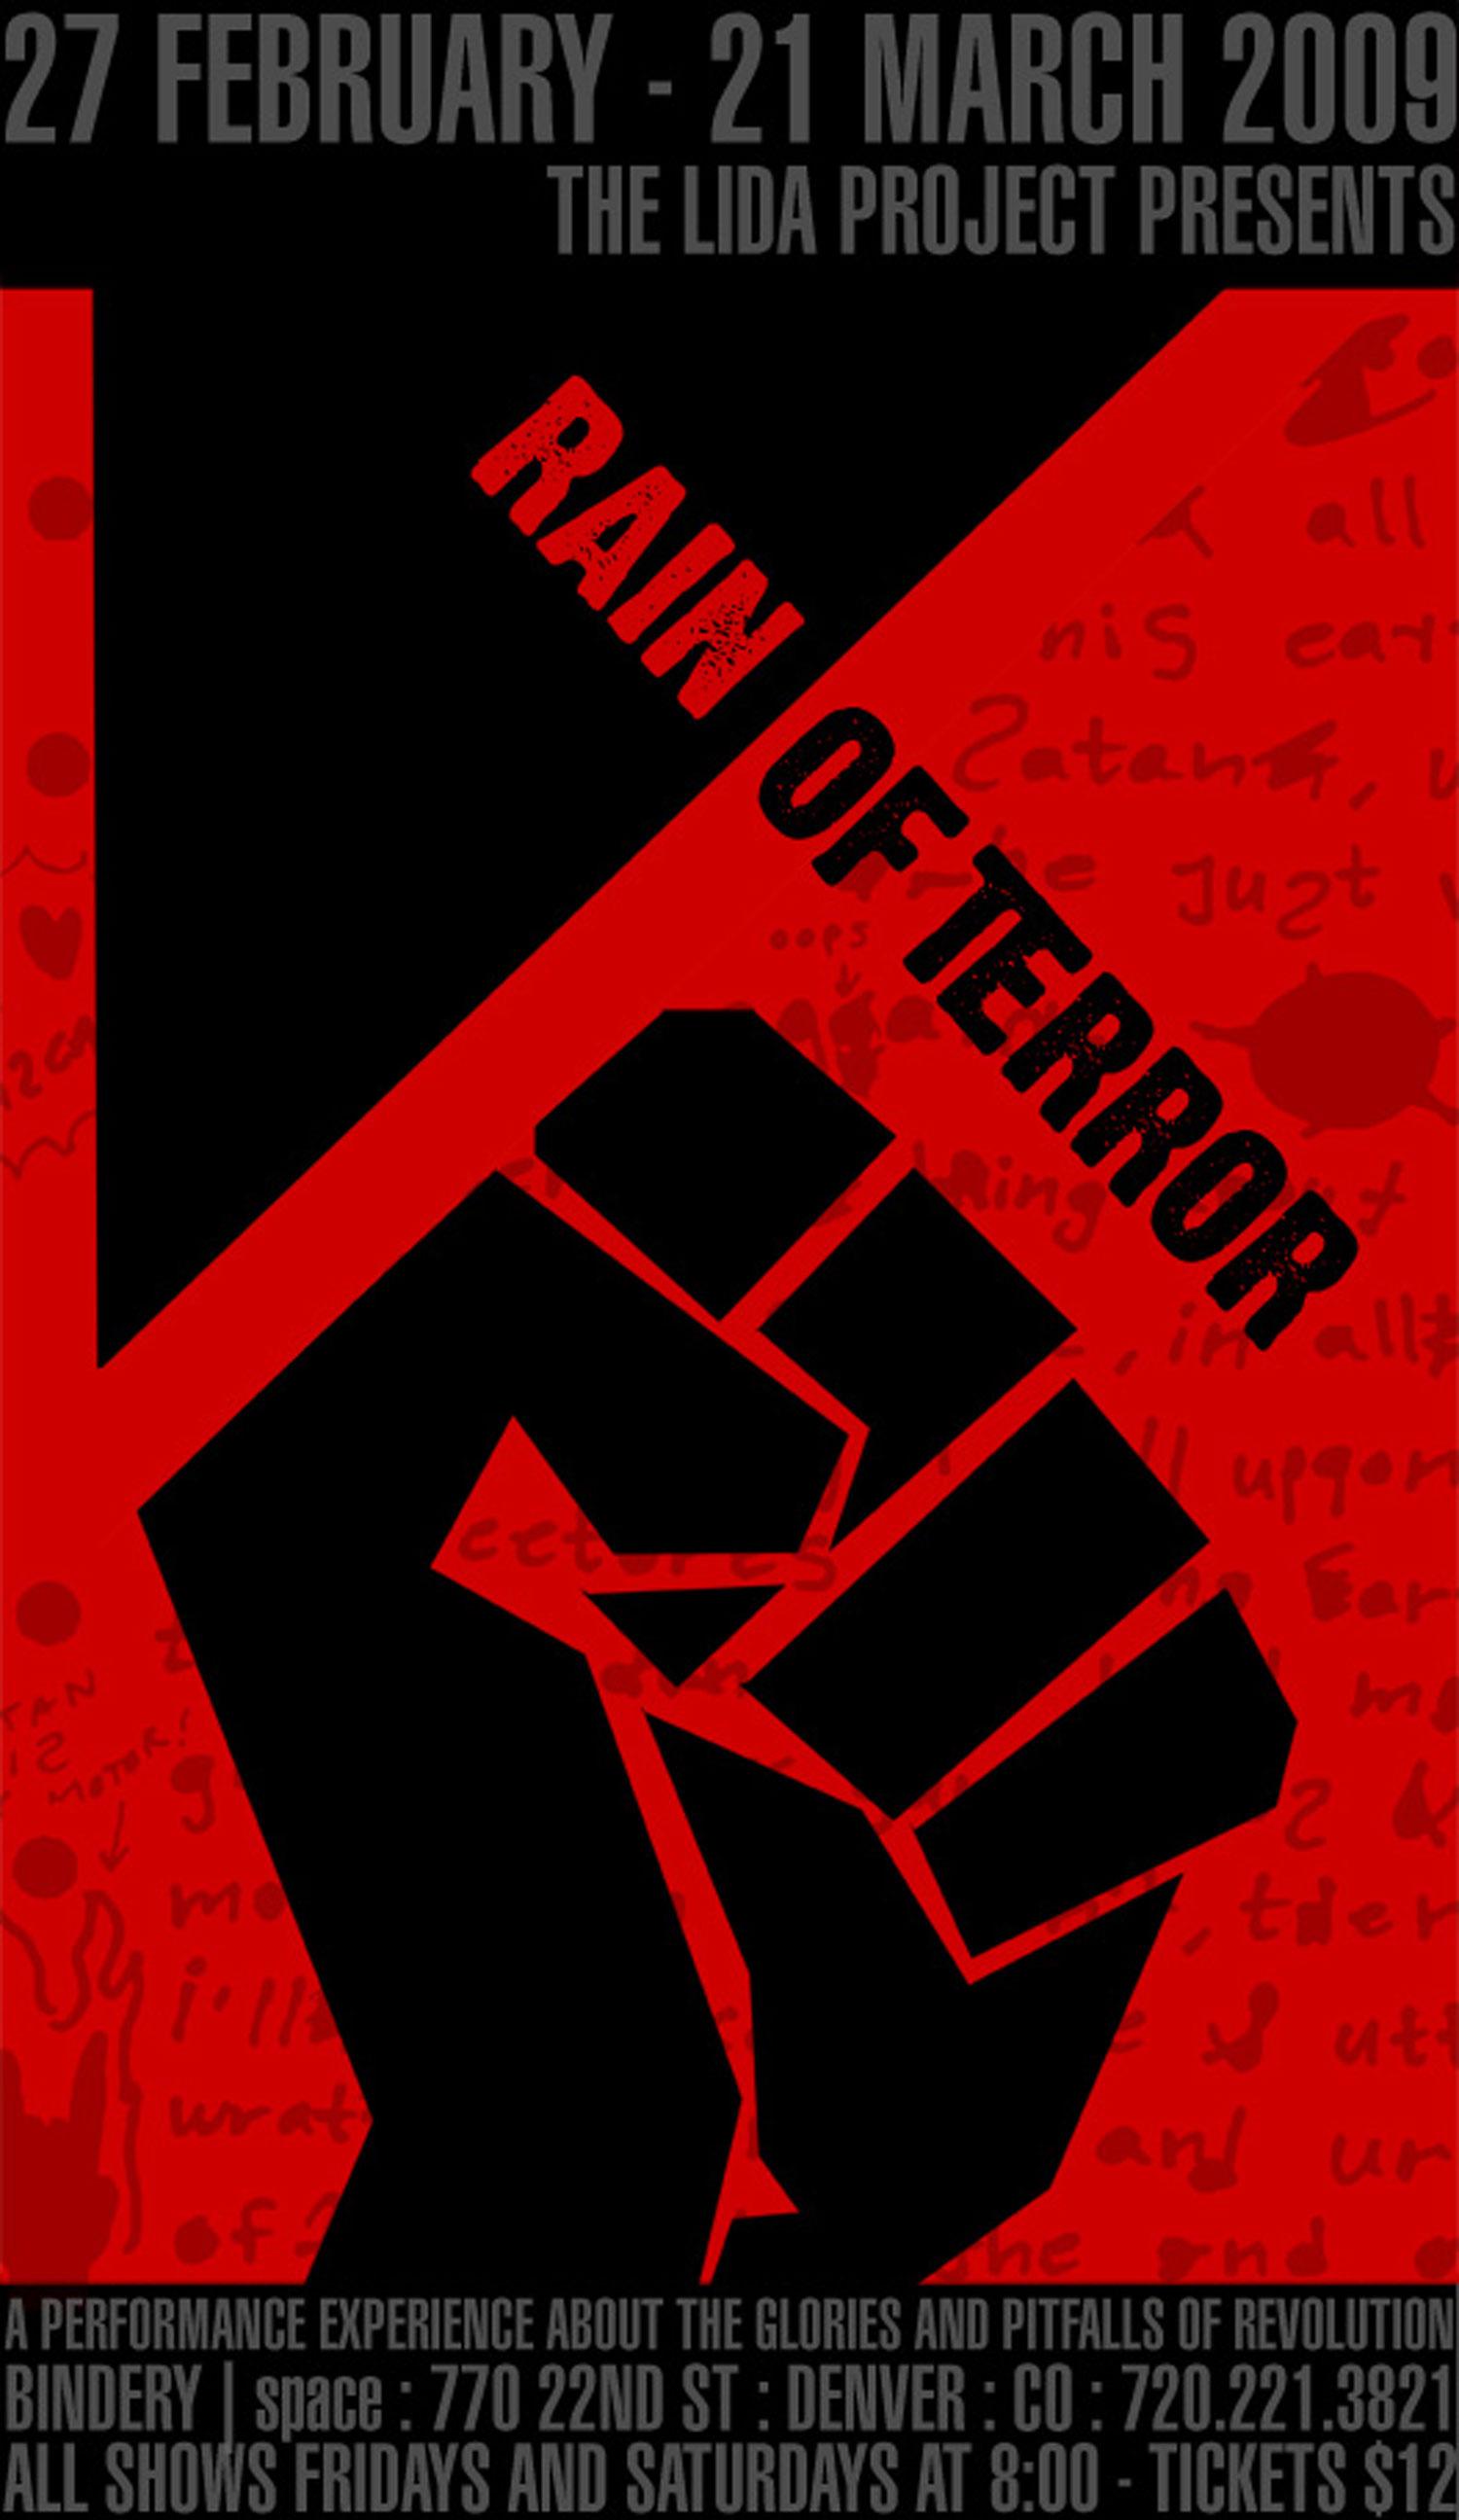 RAIN/ OF TERROR